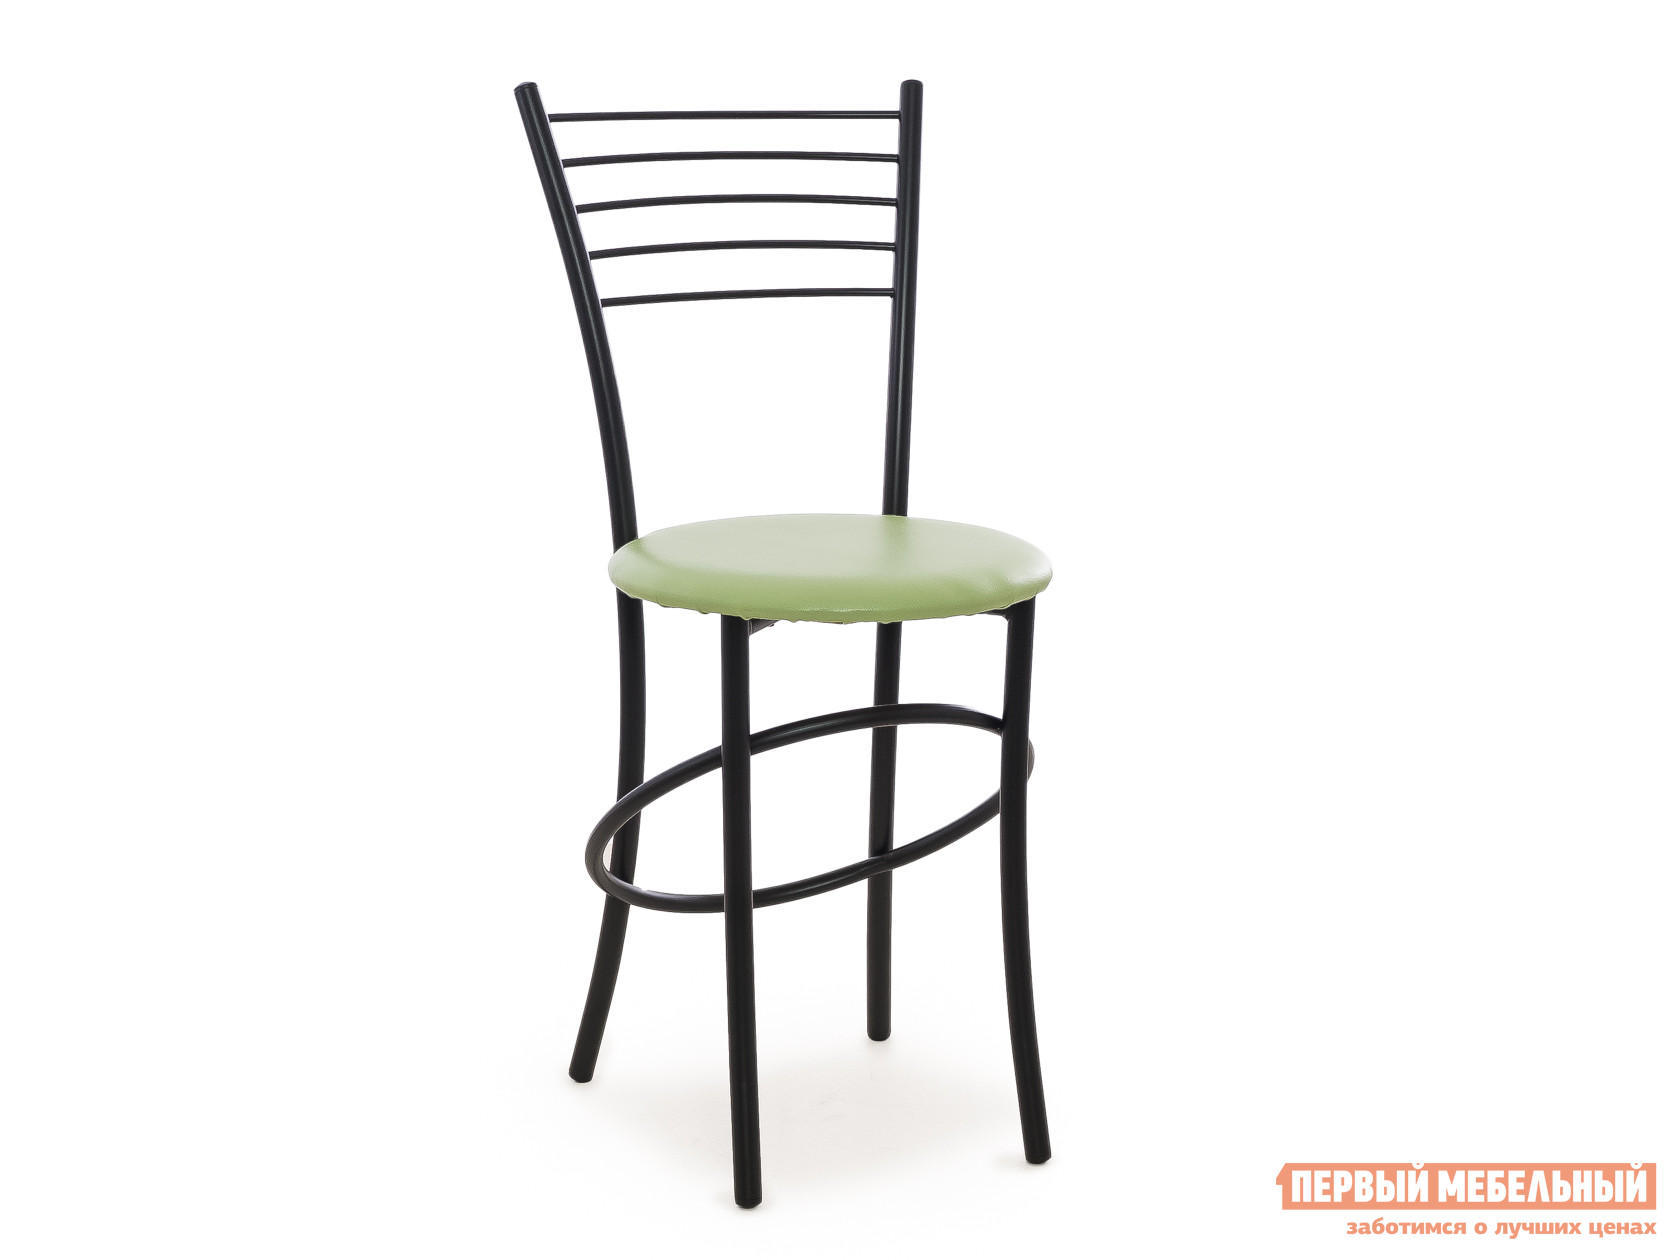 Кухонный стул Амис Сатурн Зефир, Каркас черный глянец от Купистол